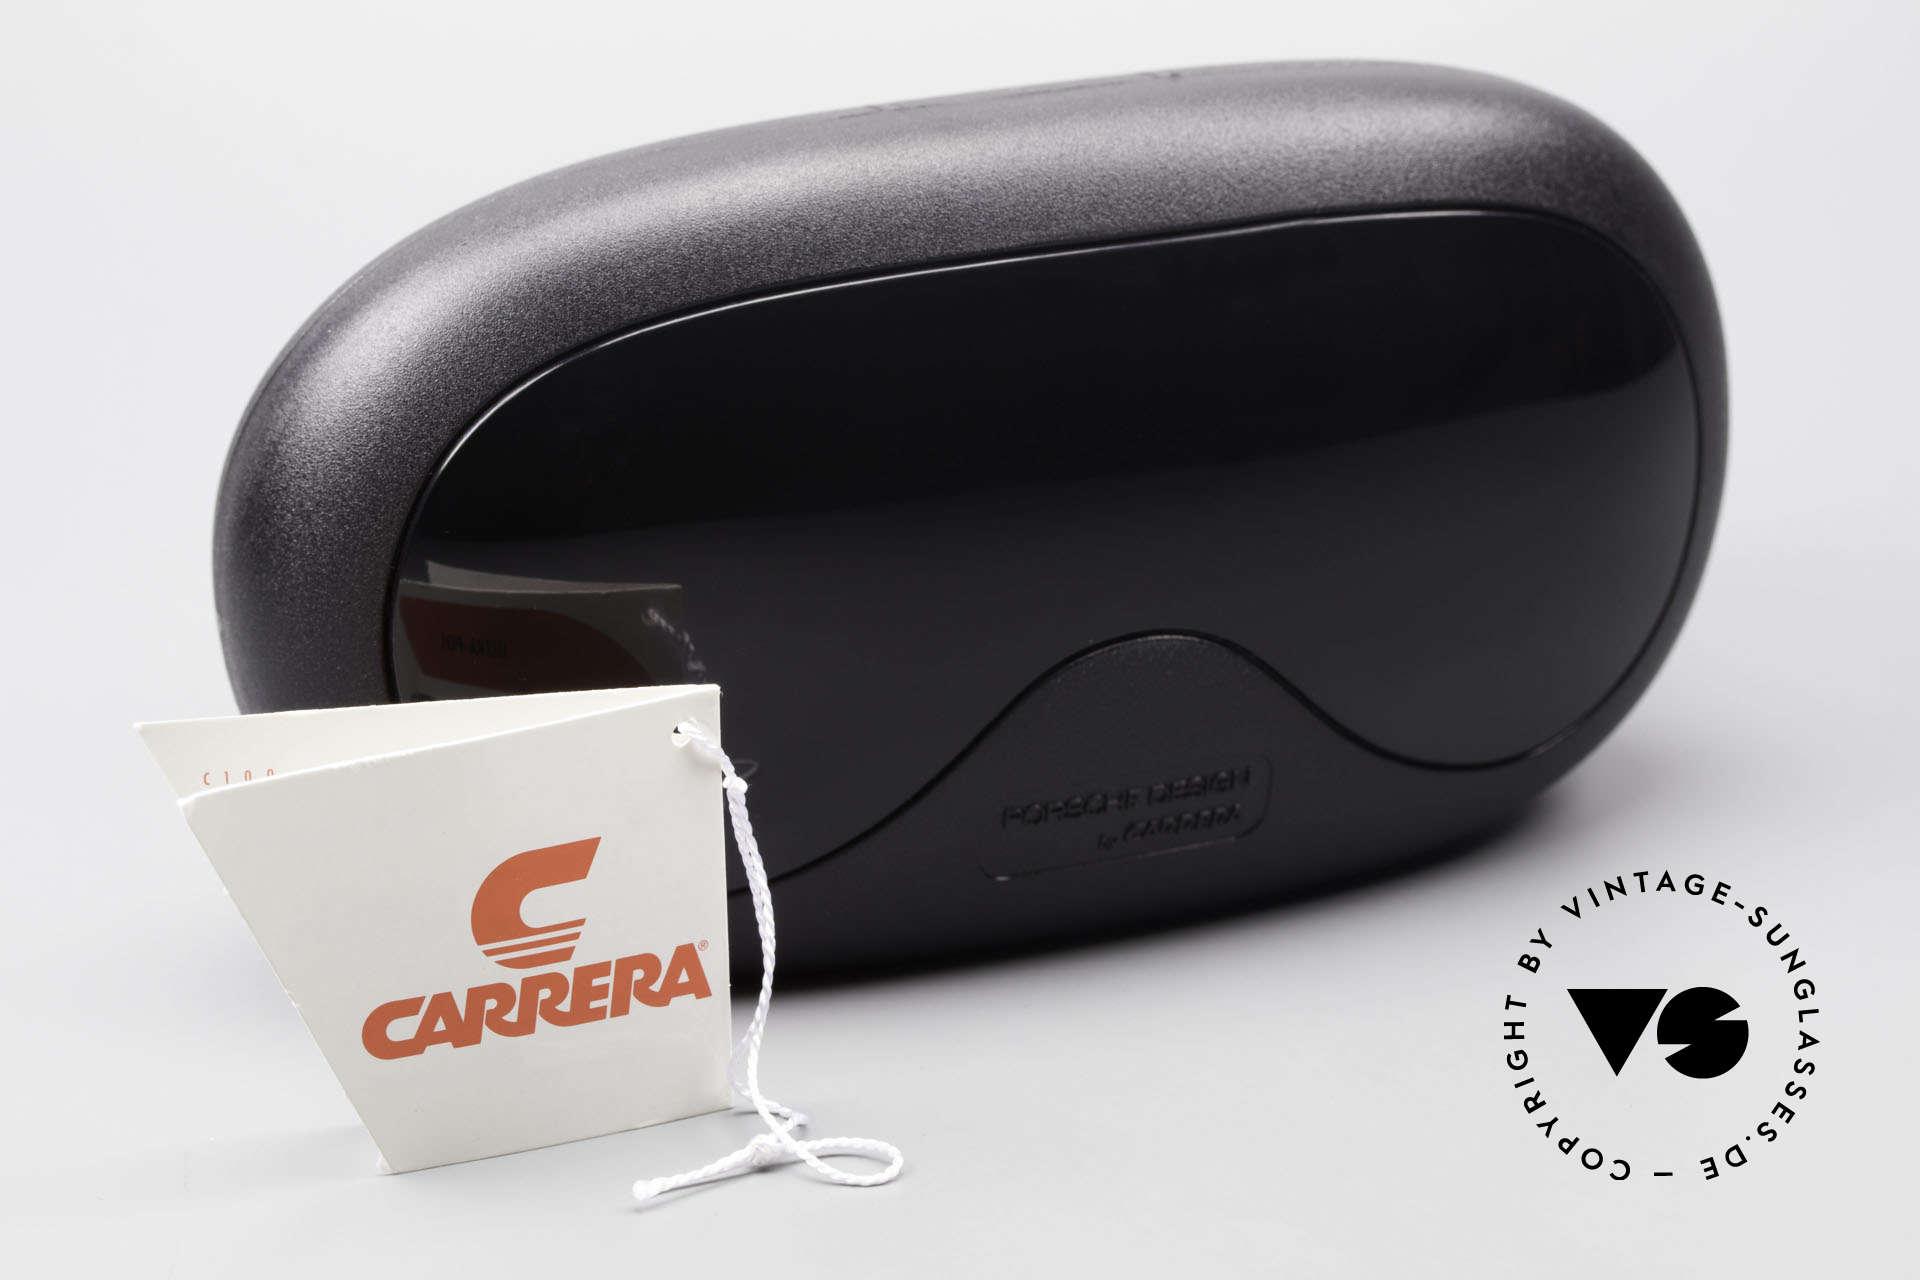 Carrera 5512 Miami Vice Shades Don Johnson, Size: large, Made for Men